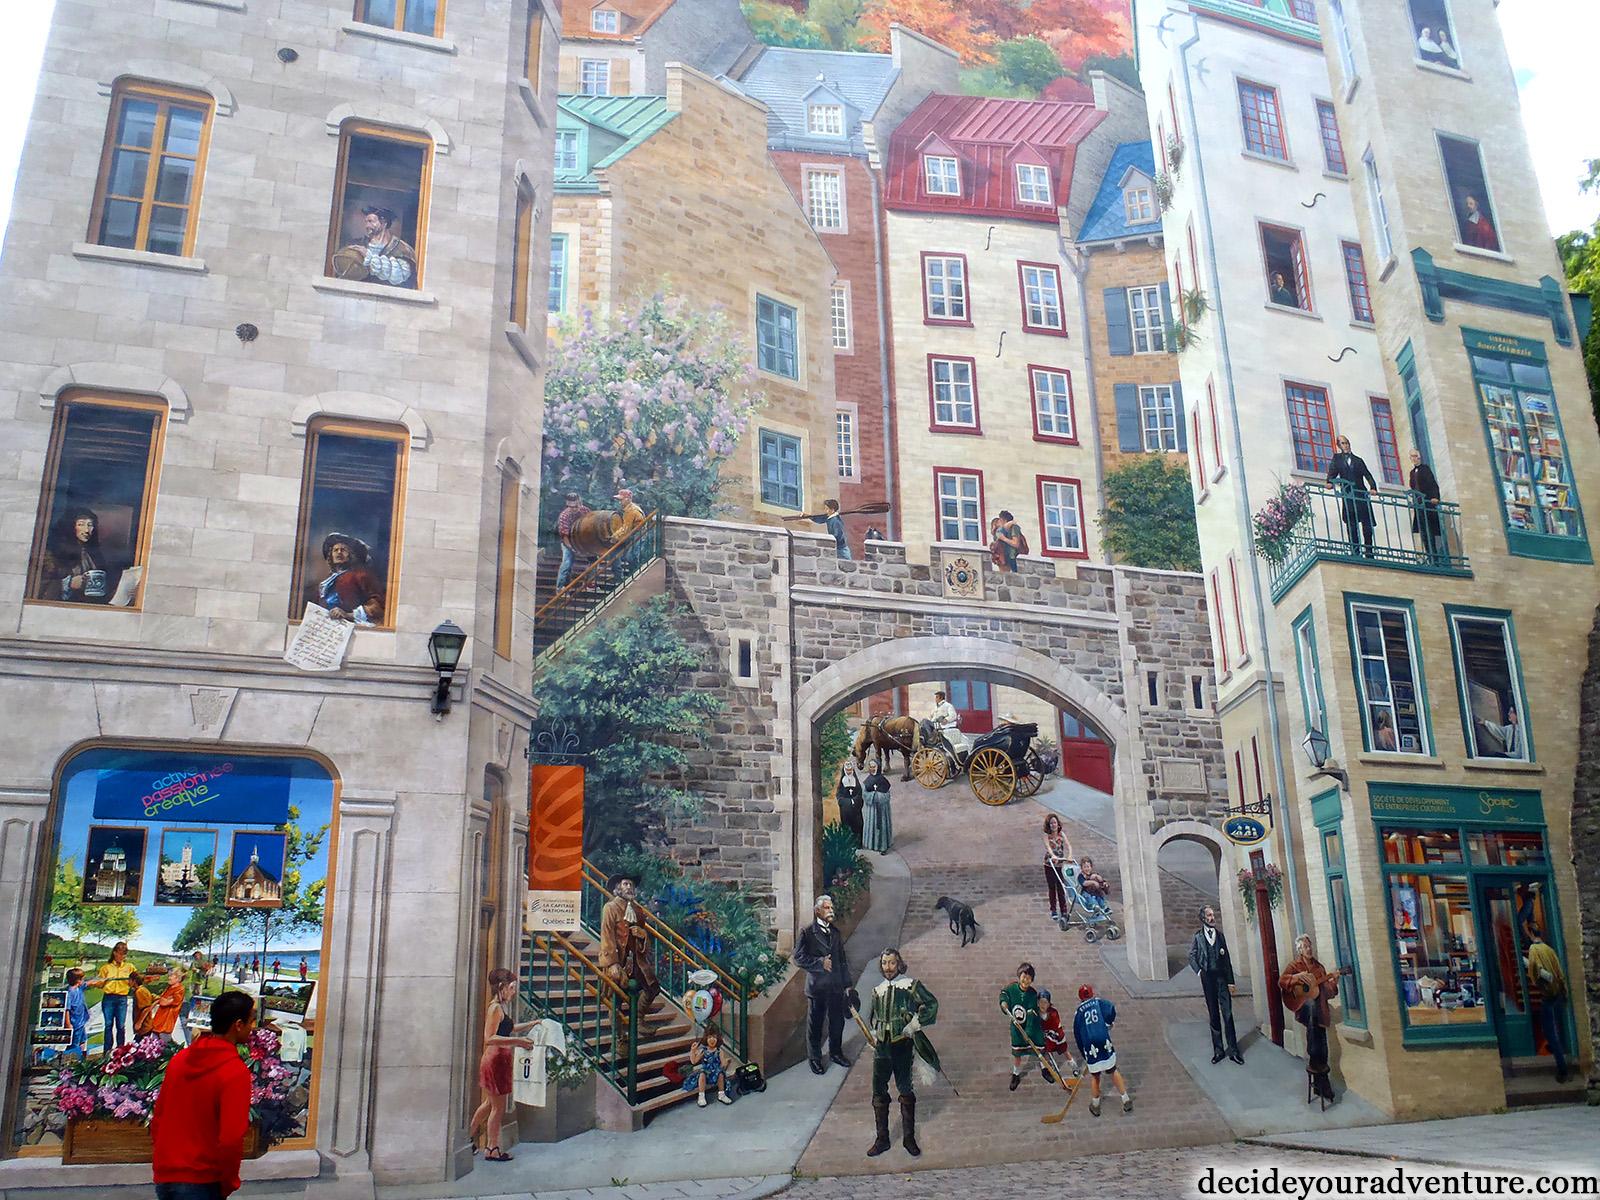 Old Québec City, Québec Province, Canada | Decide Your Adventure